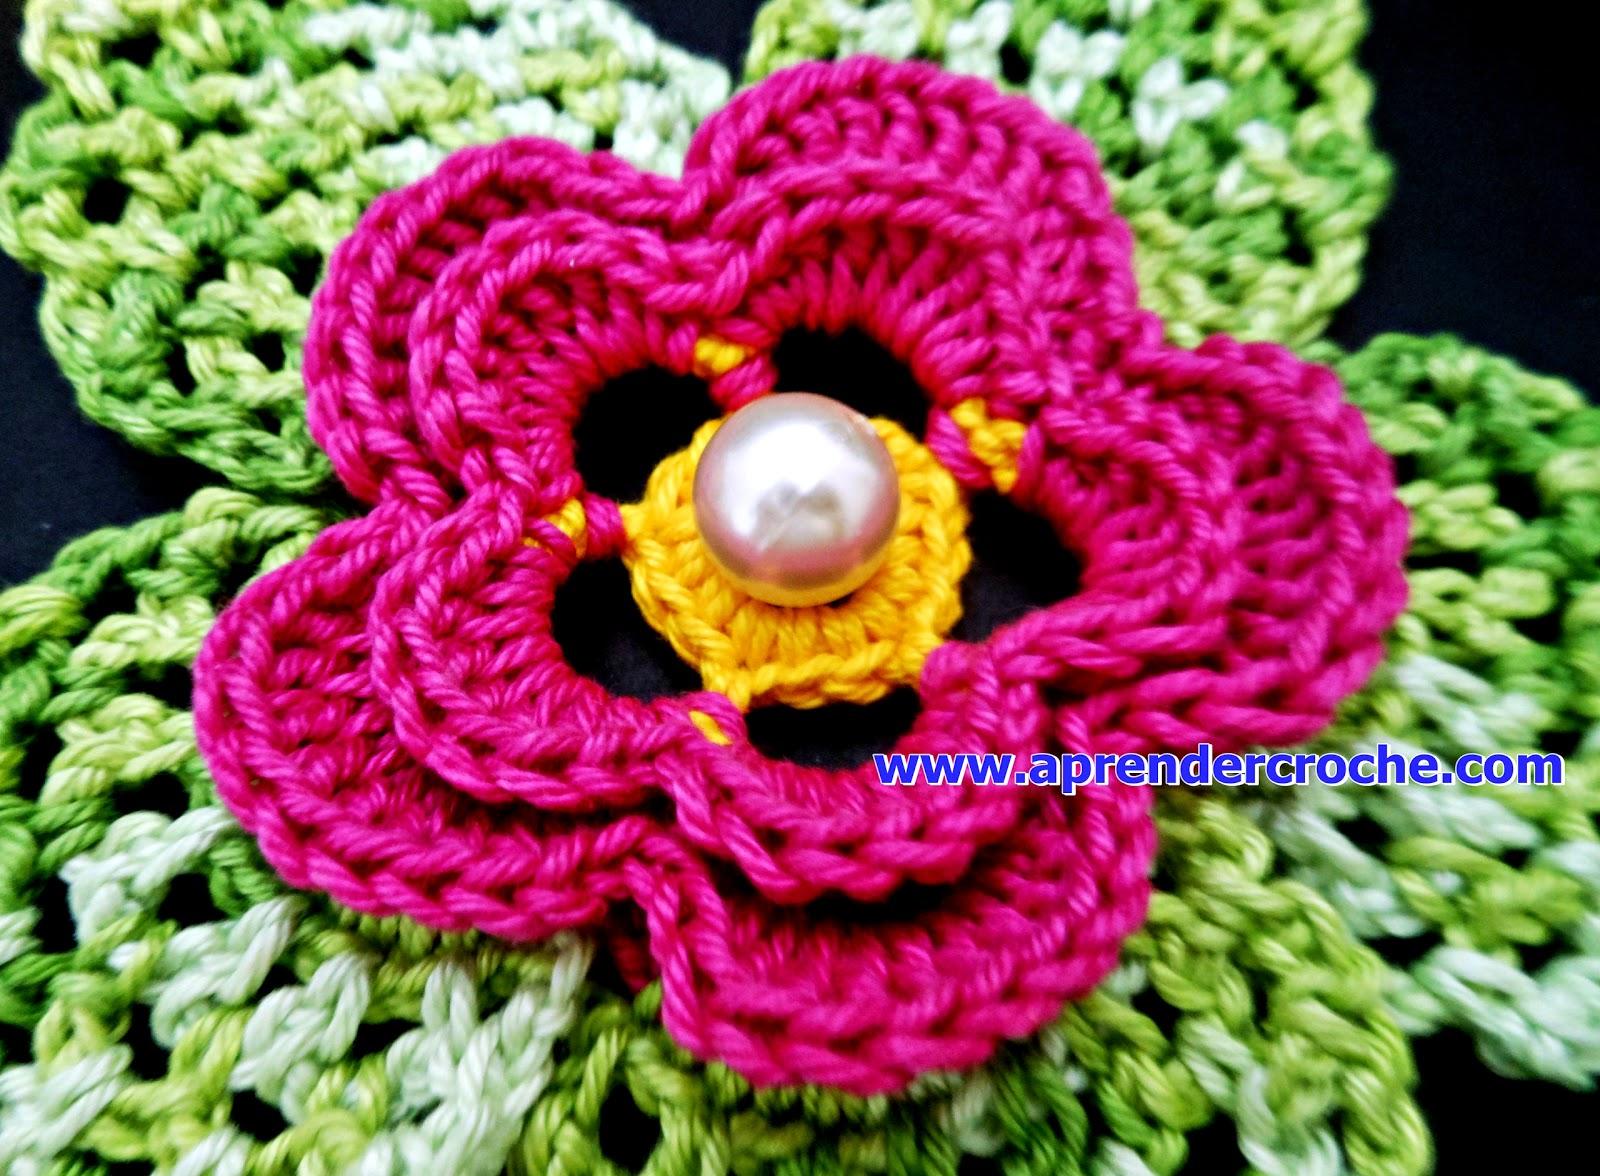 aprender croche flores duna borboto de folhas rosa verde edinir-croche loja curso de croche dvd